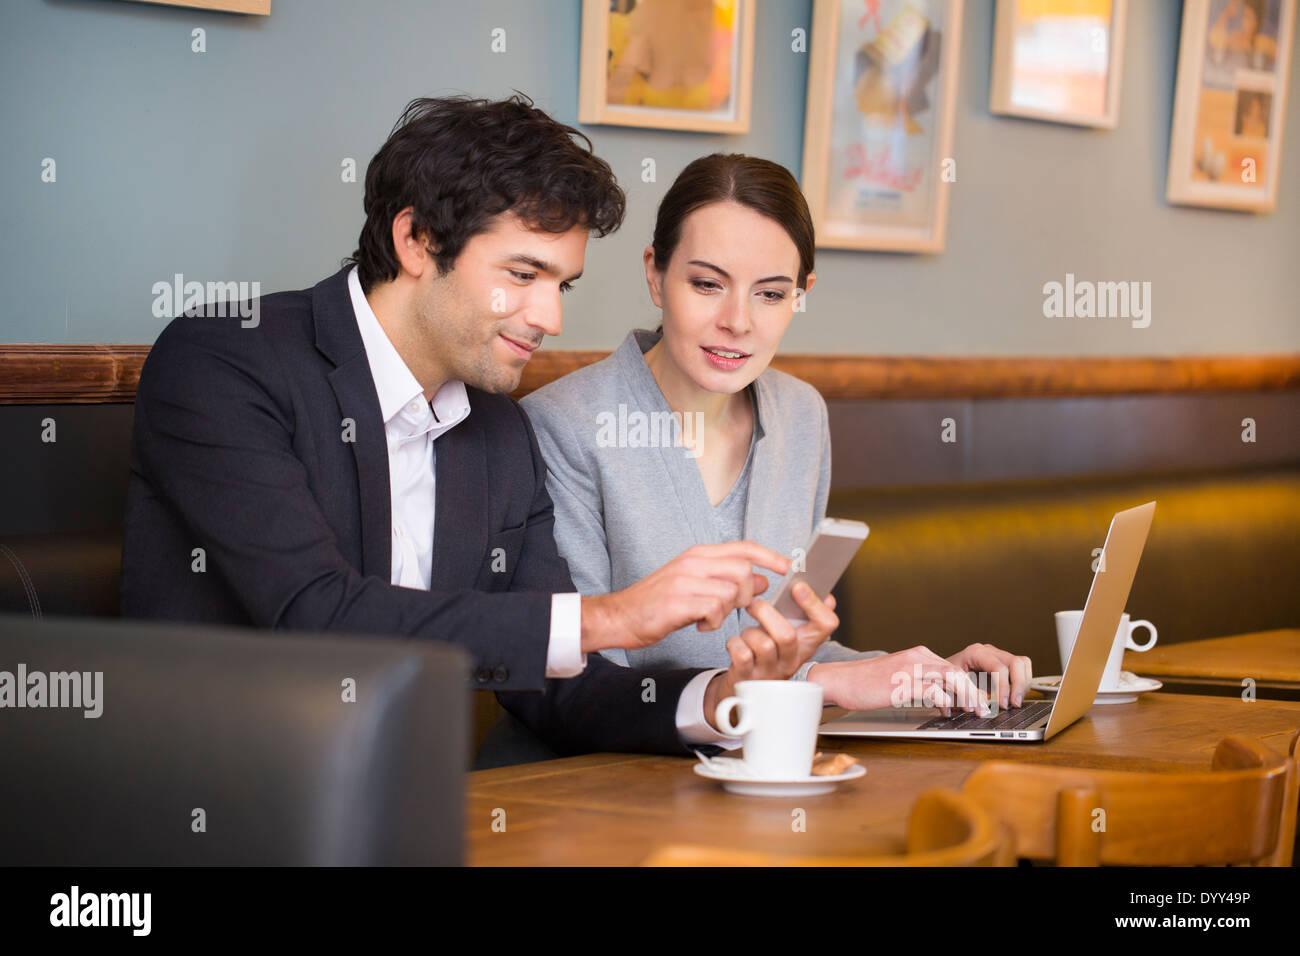 Business woman man computer colleague restaurant Stock Photo